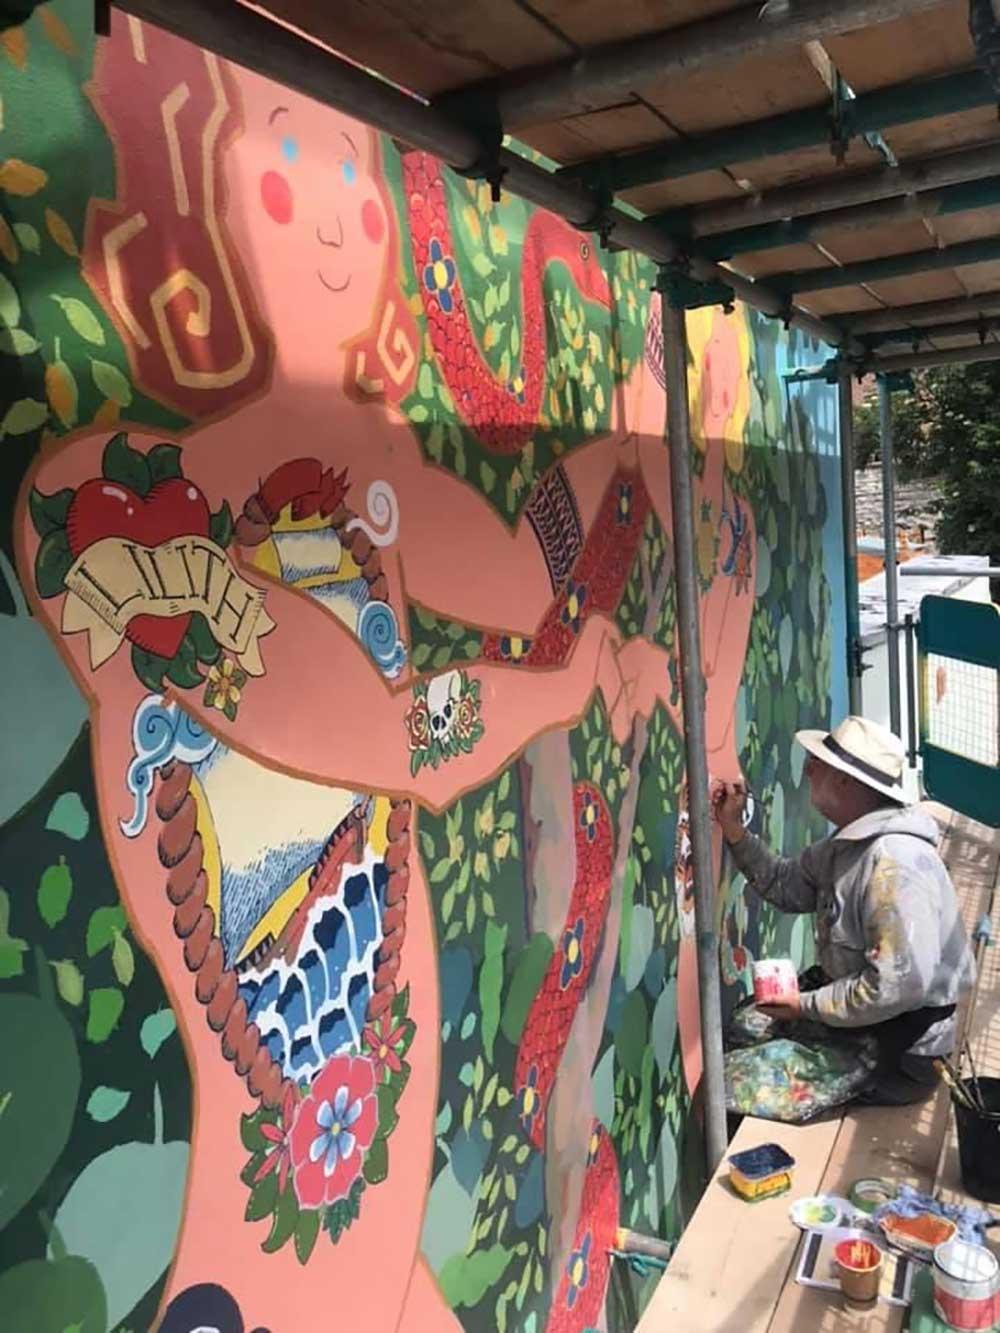 Frank-Hardwood-painting-mural-on-scaffolding